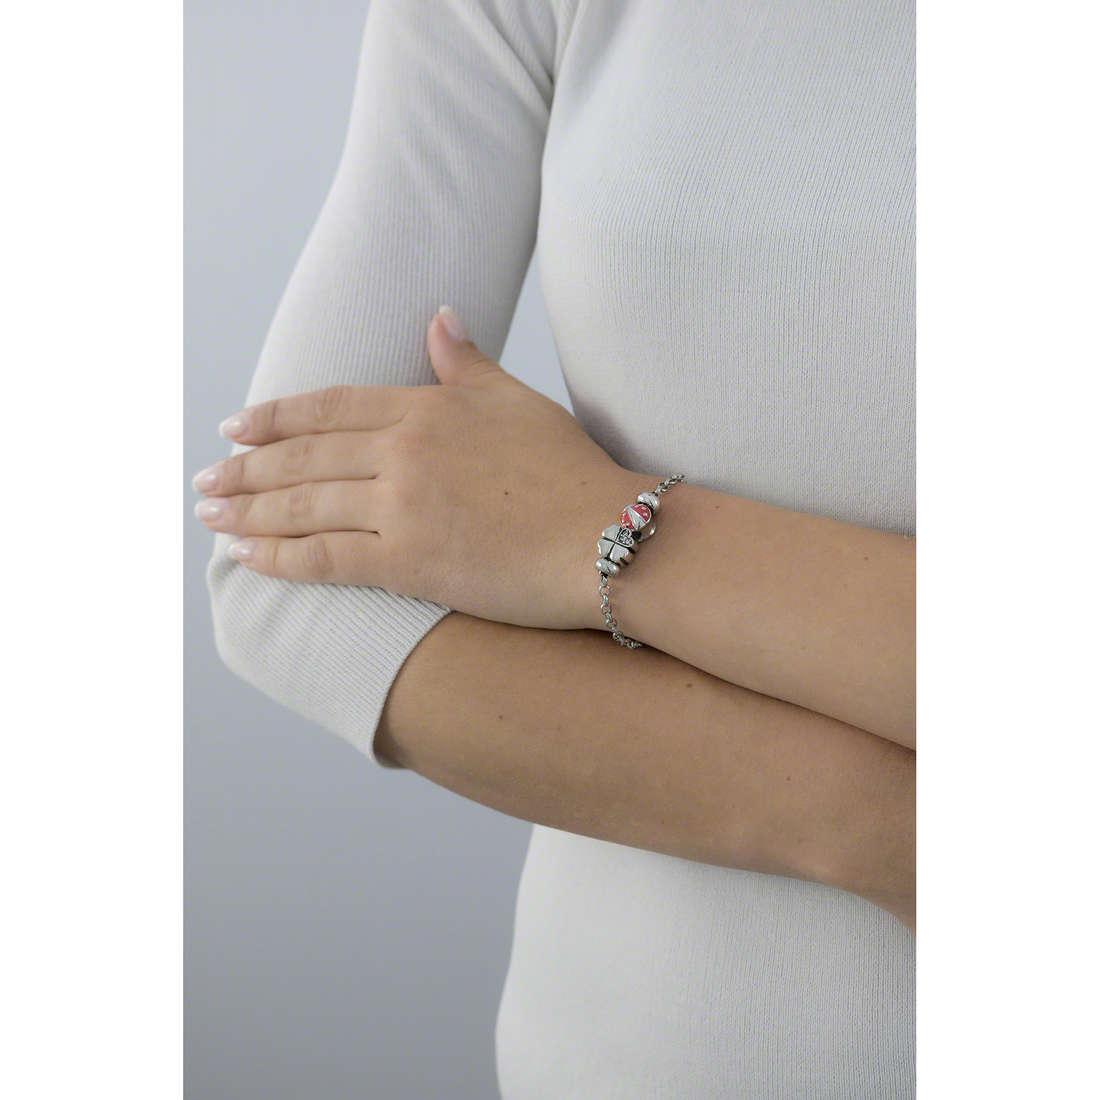 Morellato bracelets Drops femme SCZ676 indosso